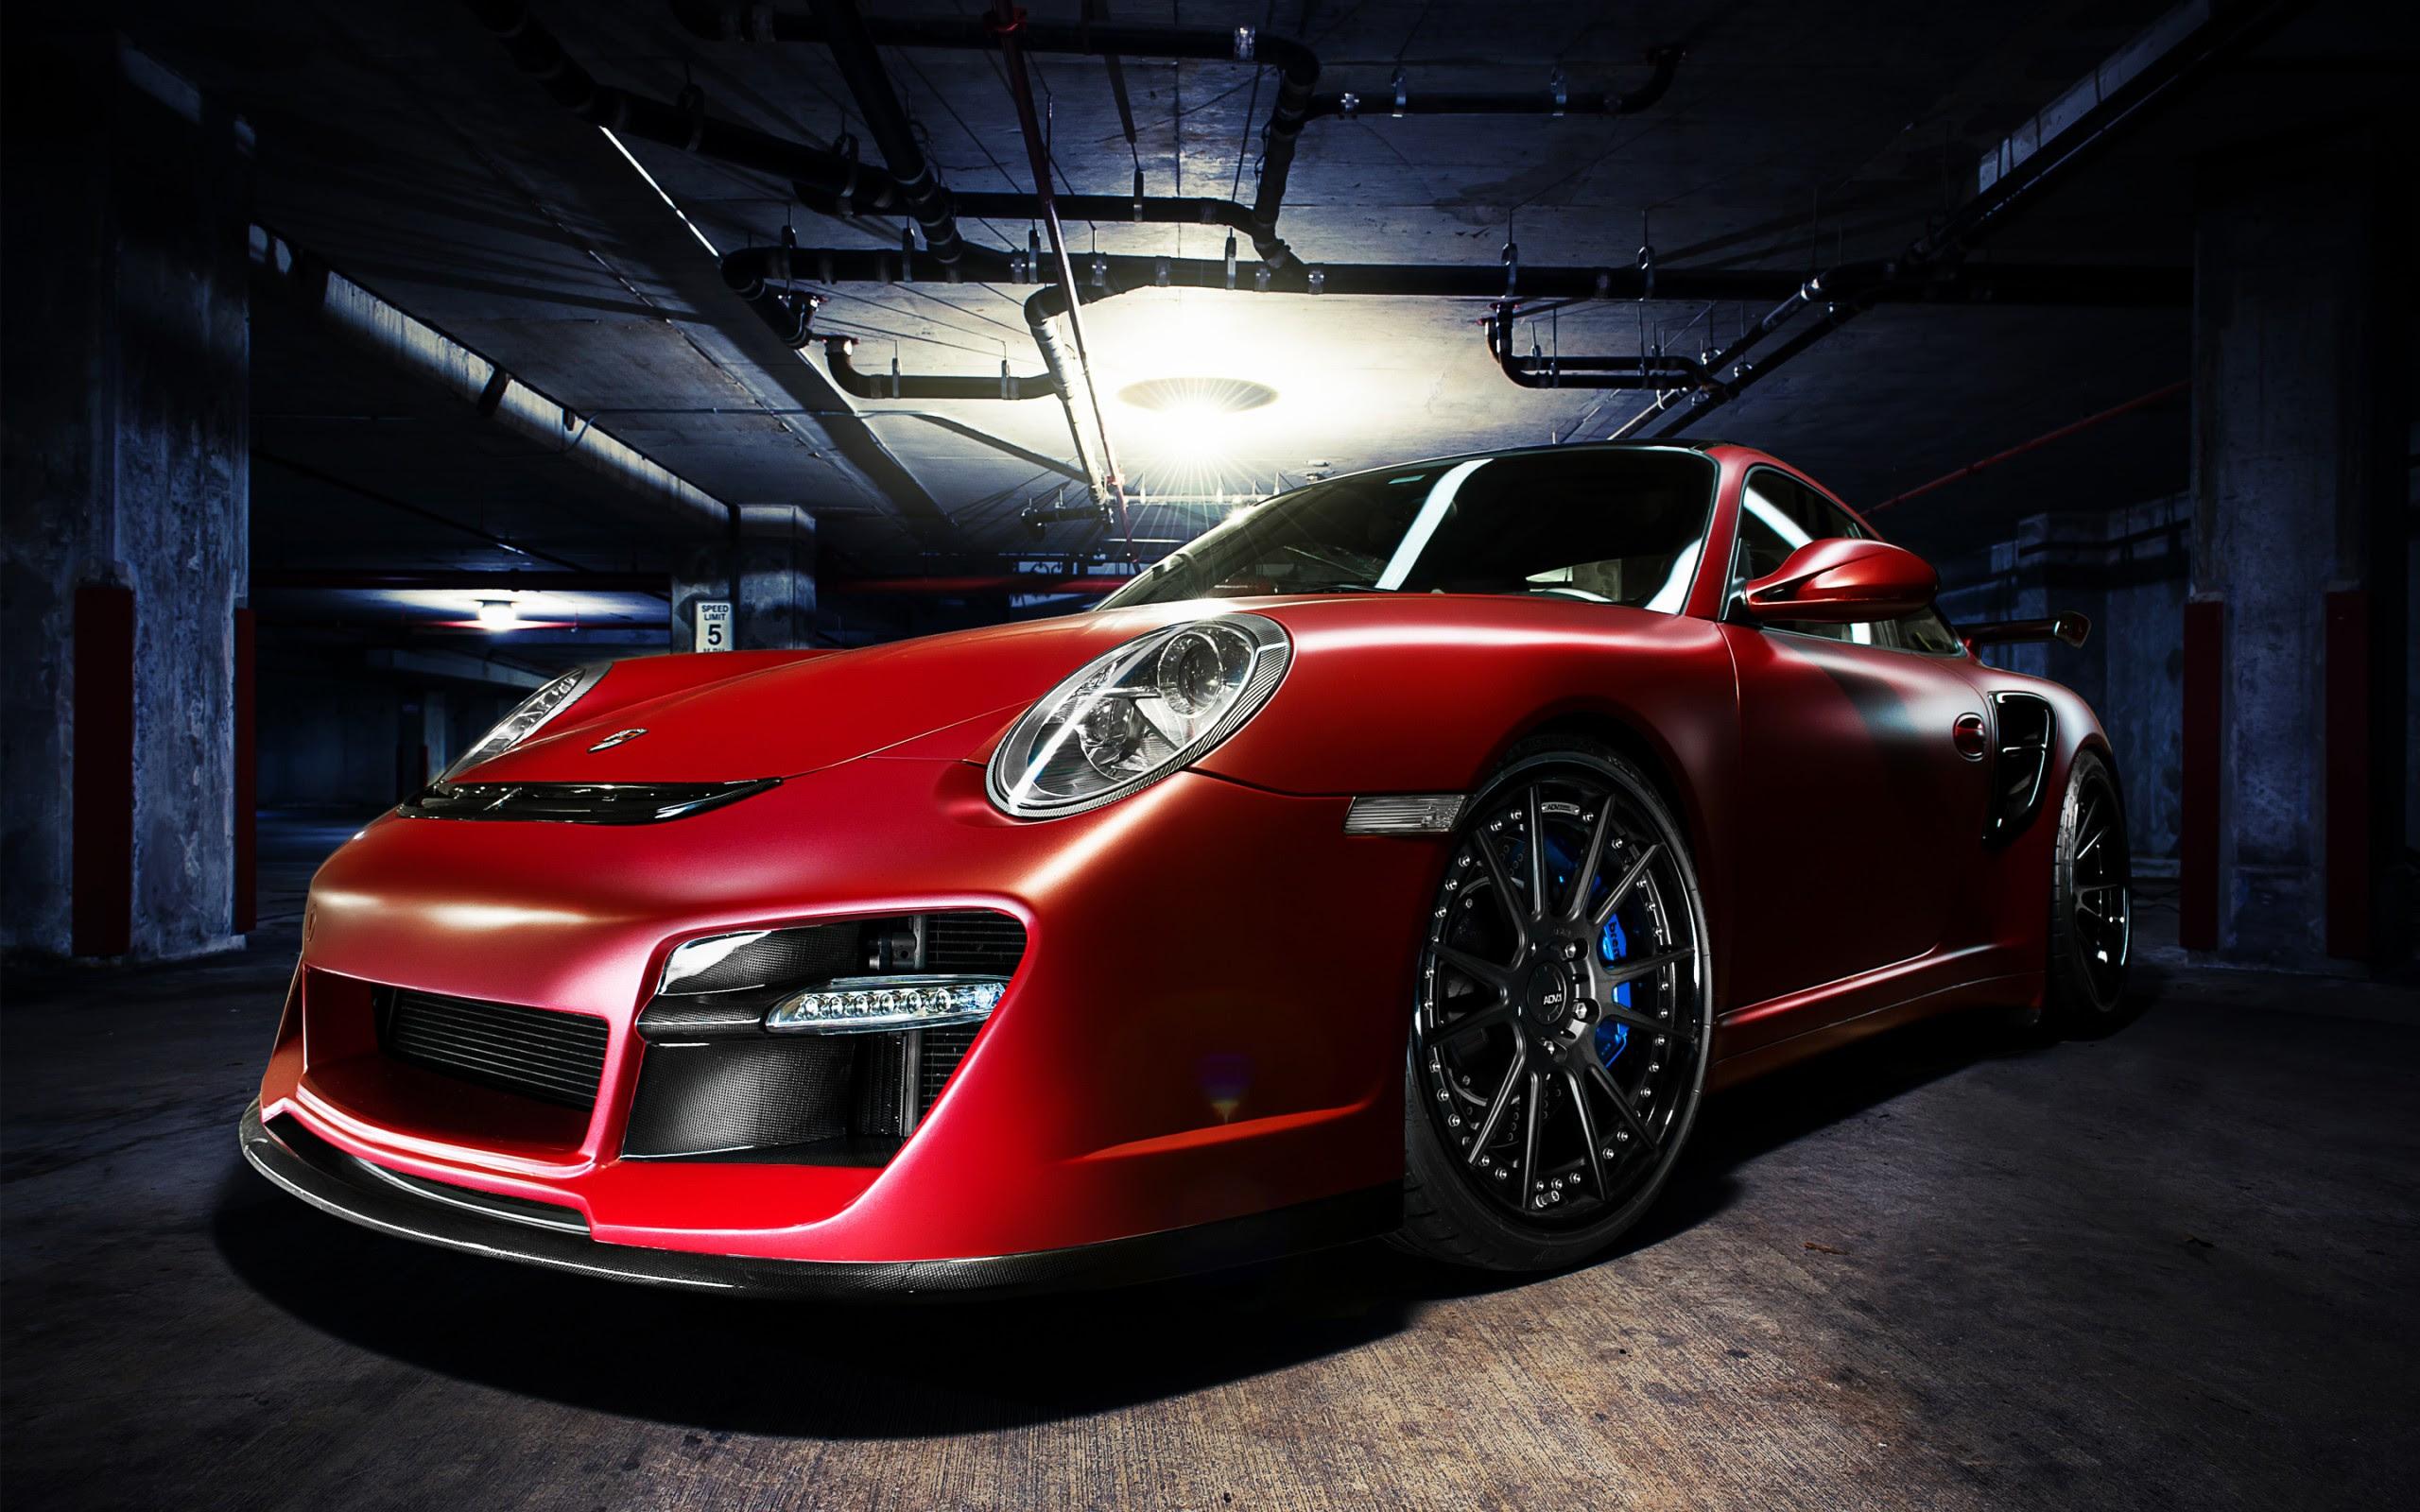 ADV1 Red Porsche Wallpaper | HD Car Wallpapers | ID #5581